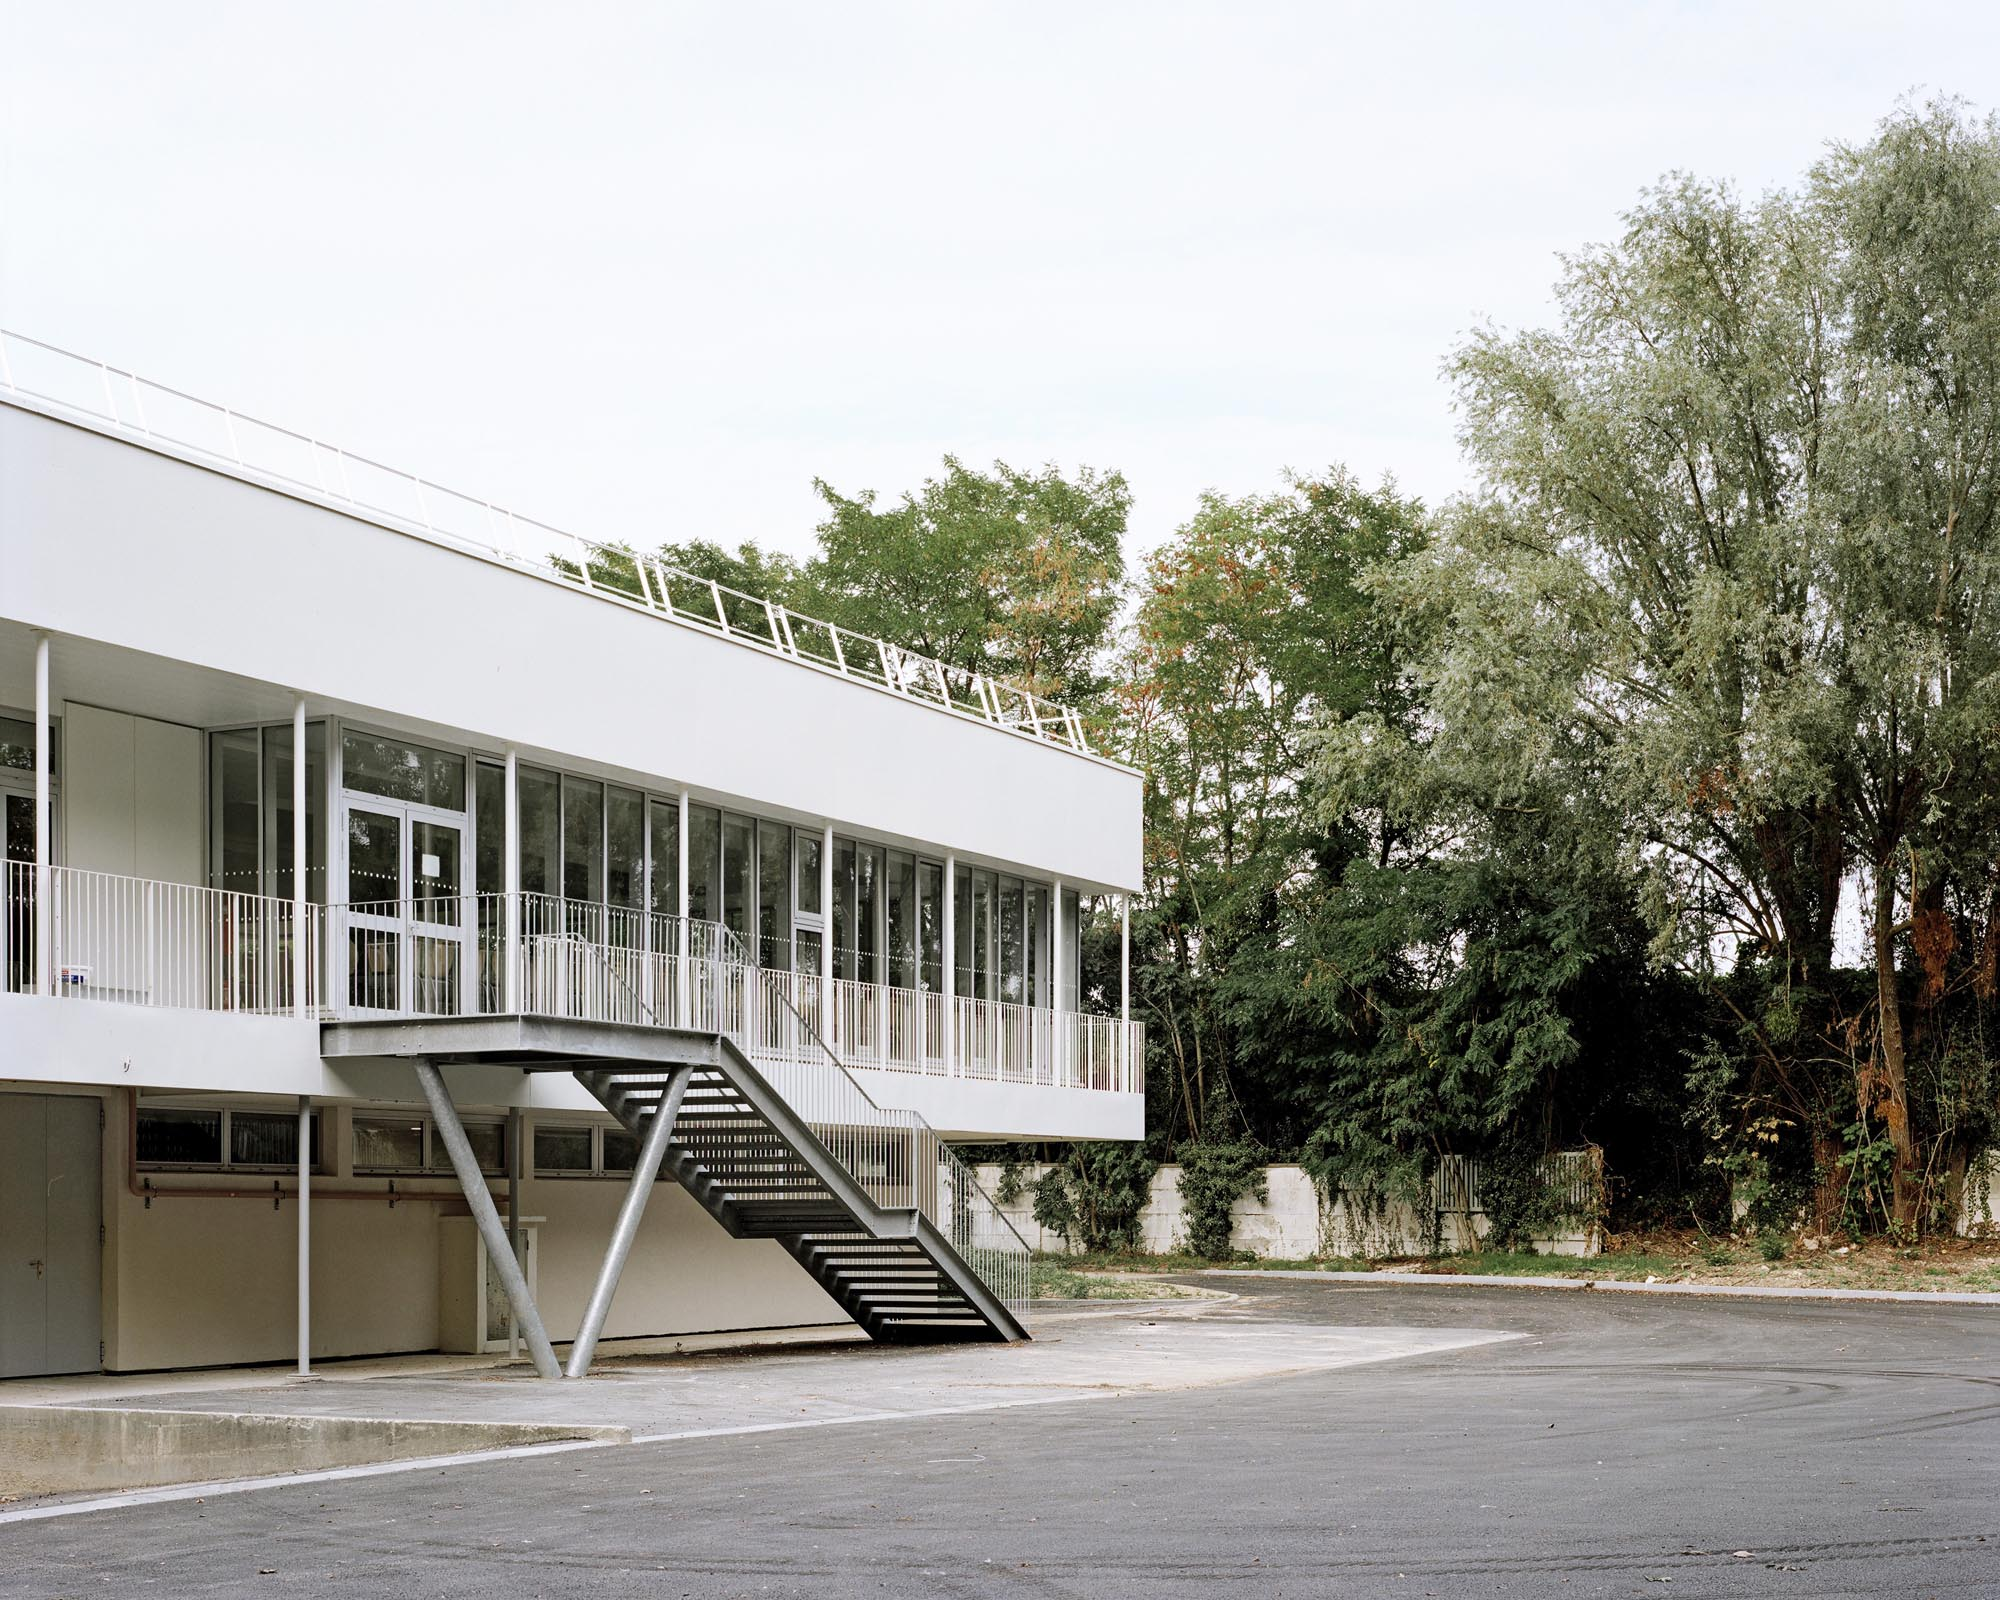 Bachelard and Lumière High Schools